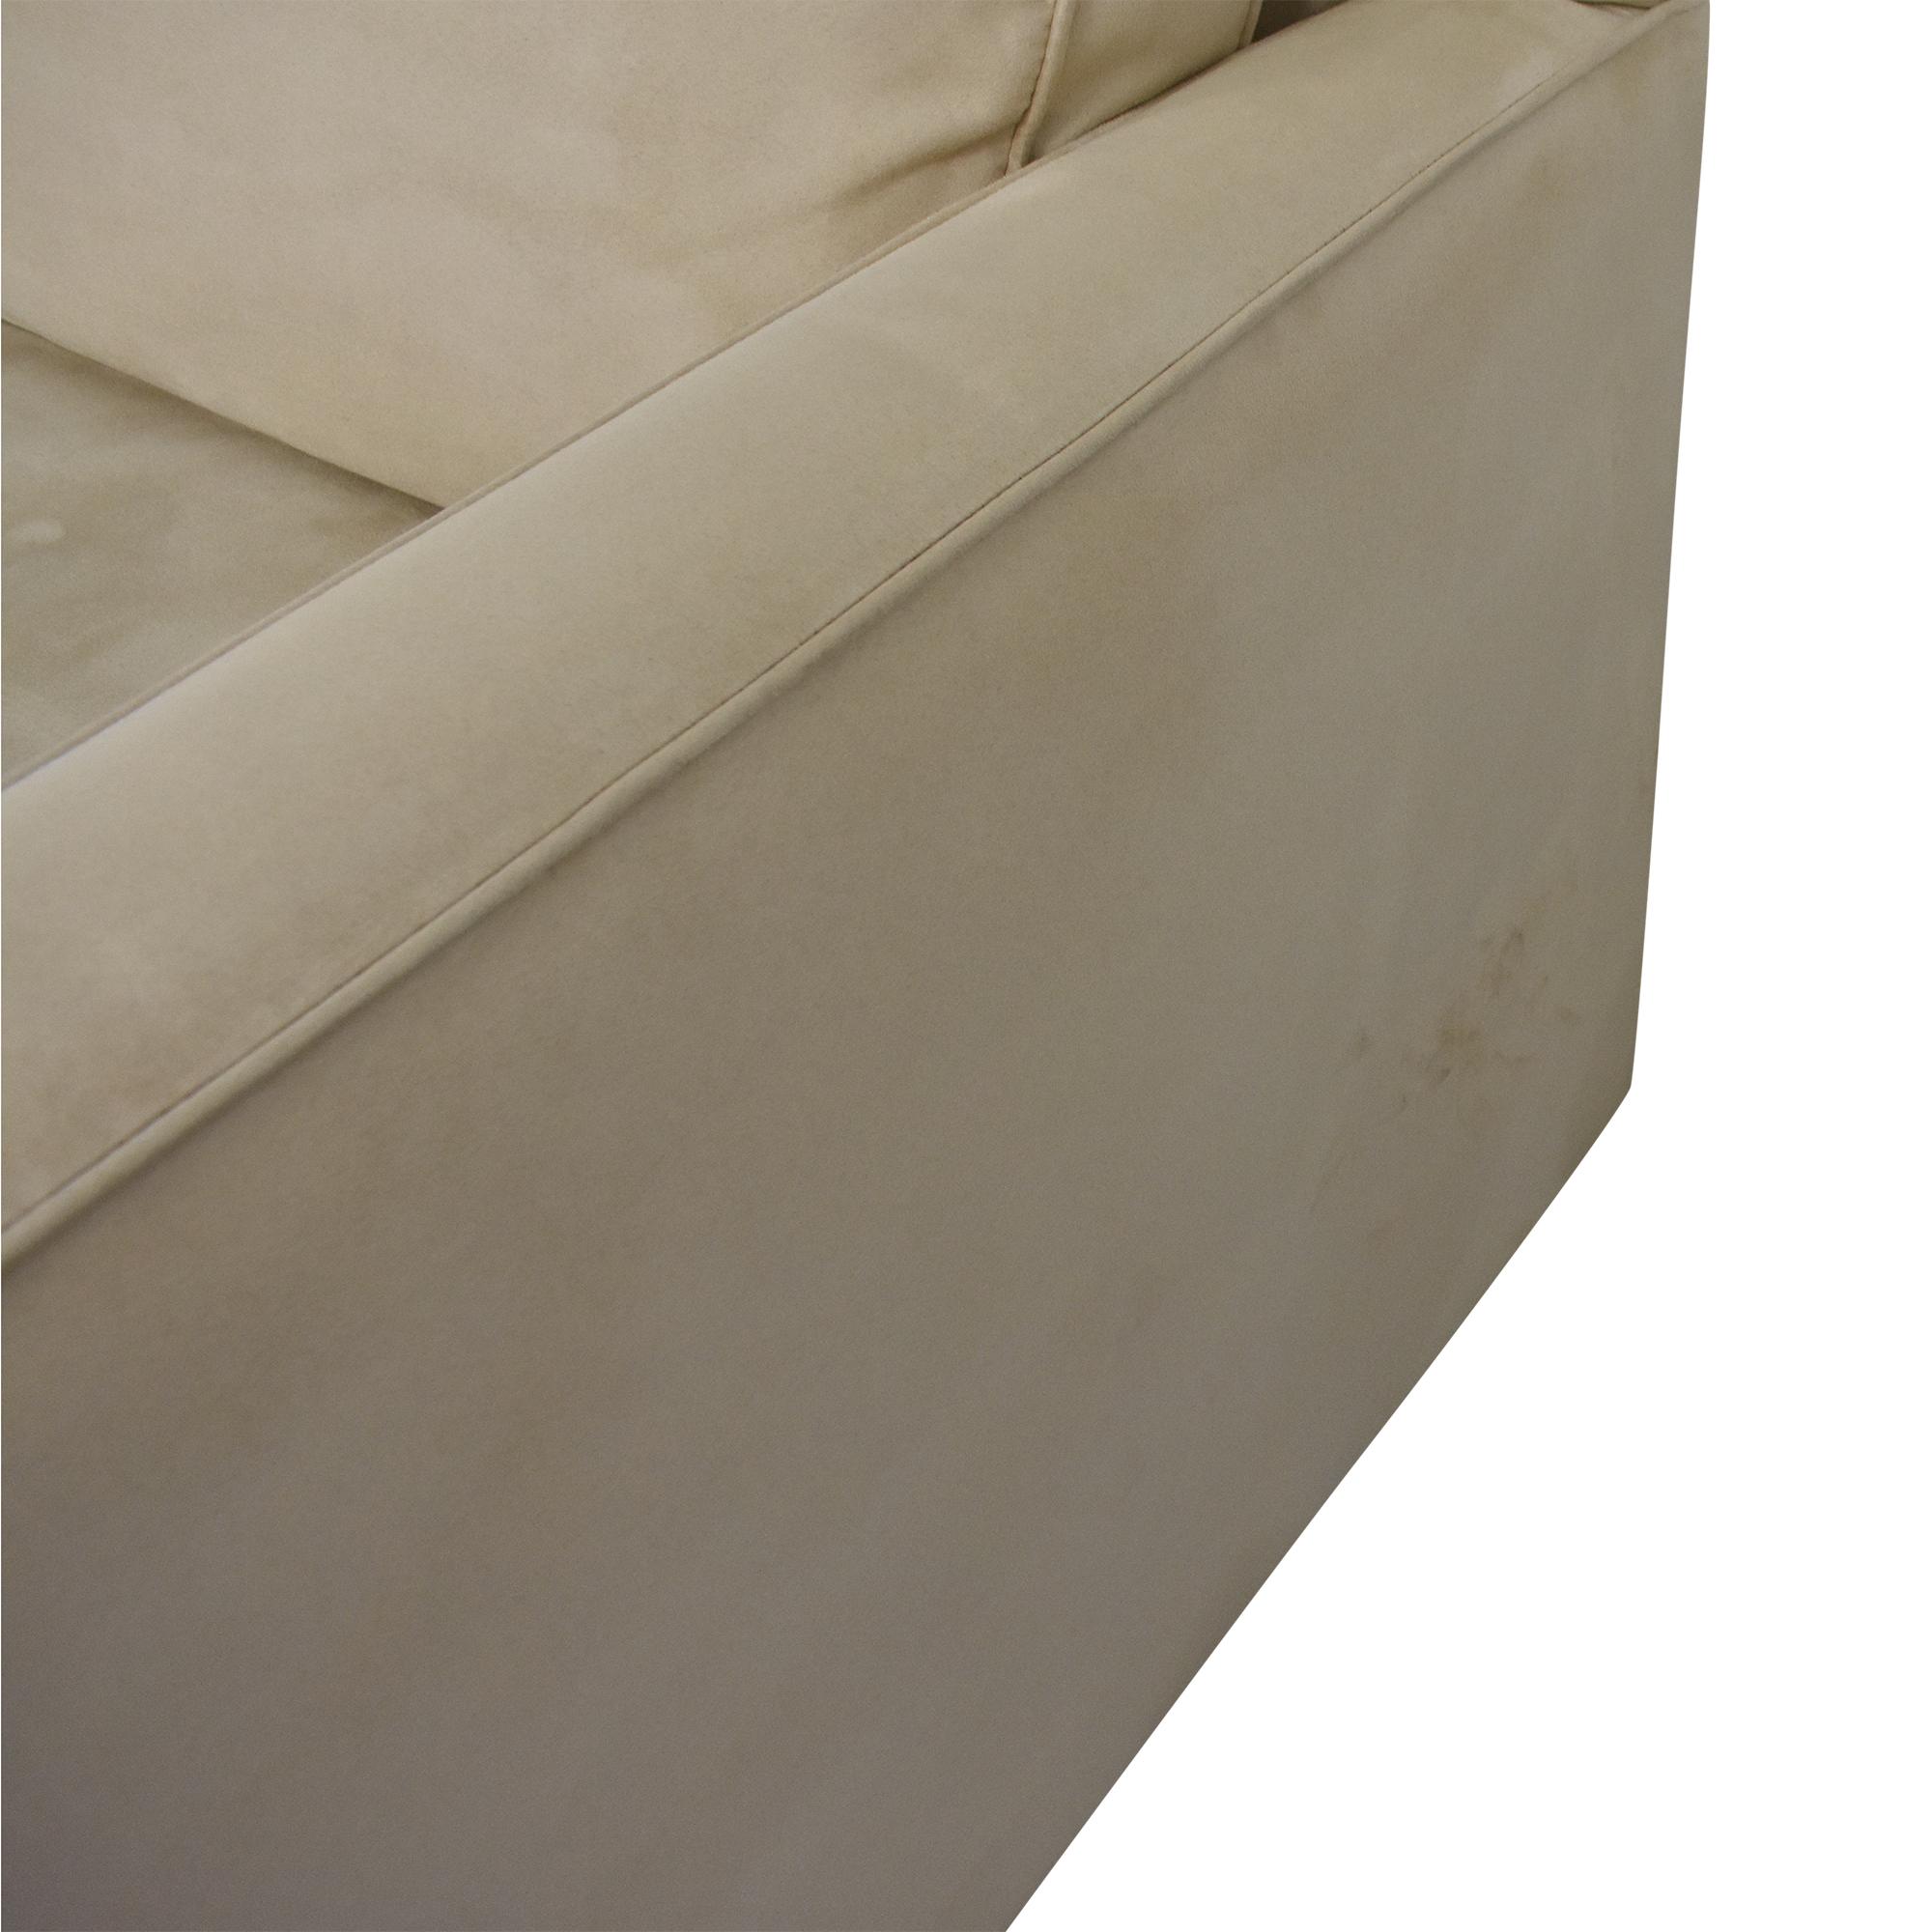 Crate & Barrel Crate & Barrel Davis Chaise Sectional Sofa price